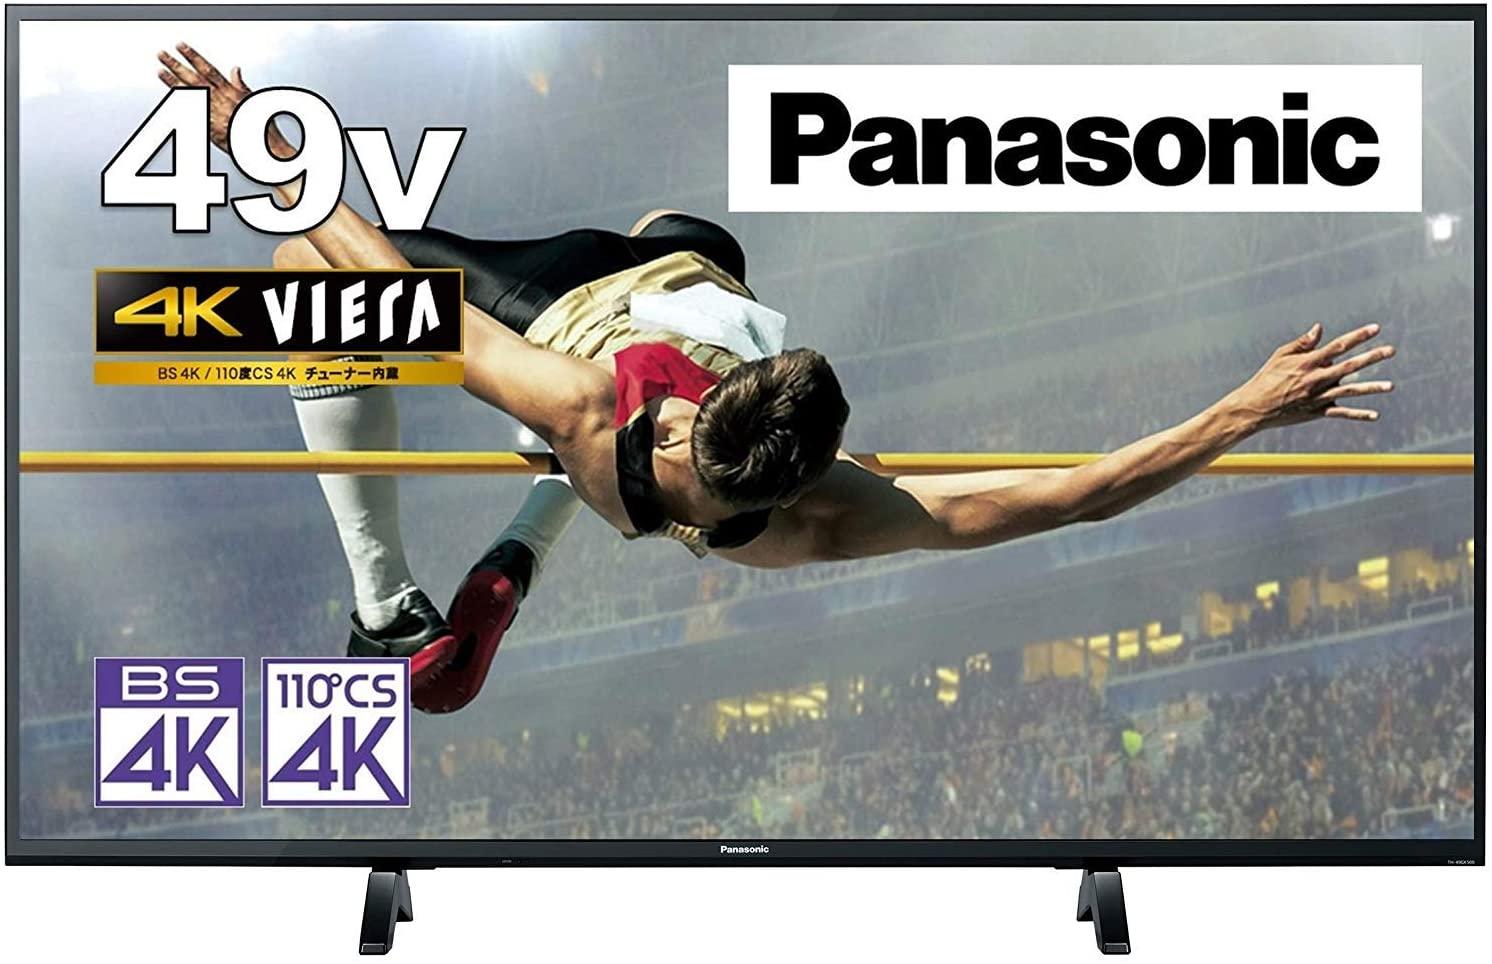 【Panasonic 】 49V型 4K 最新型液晶テレビ